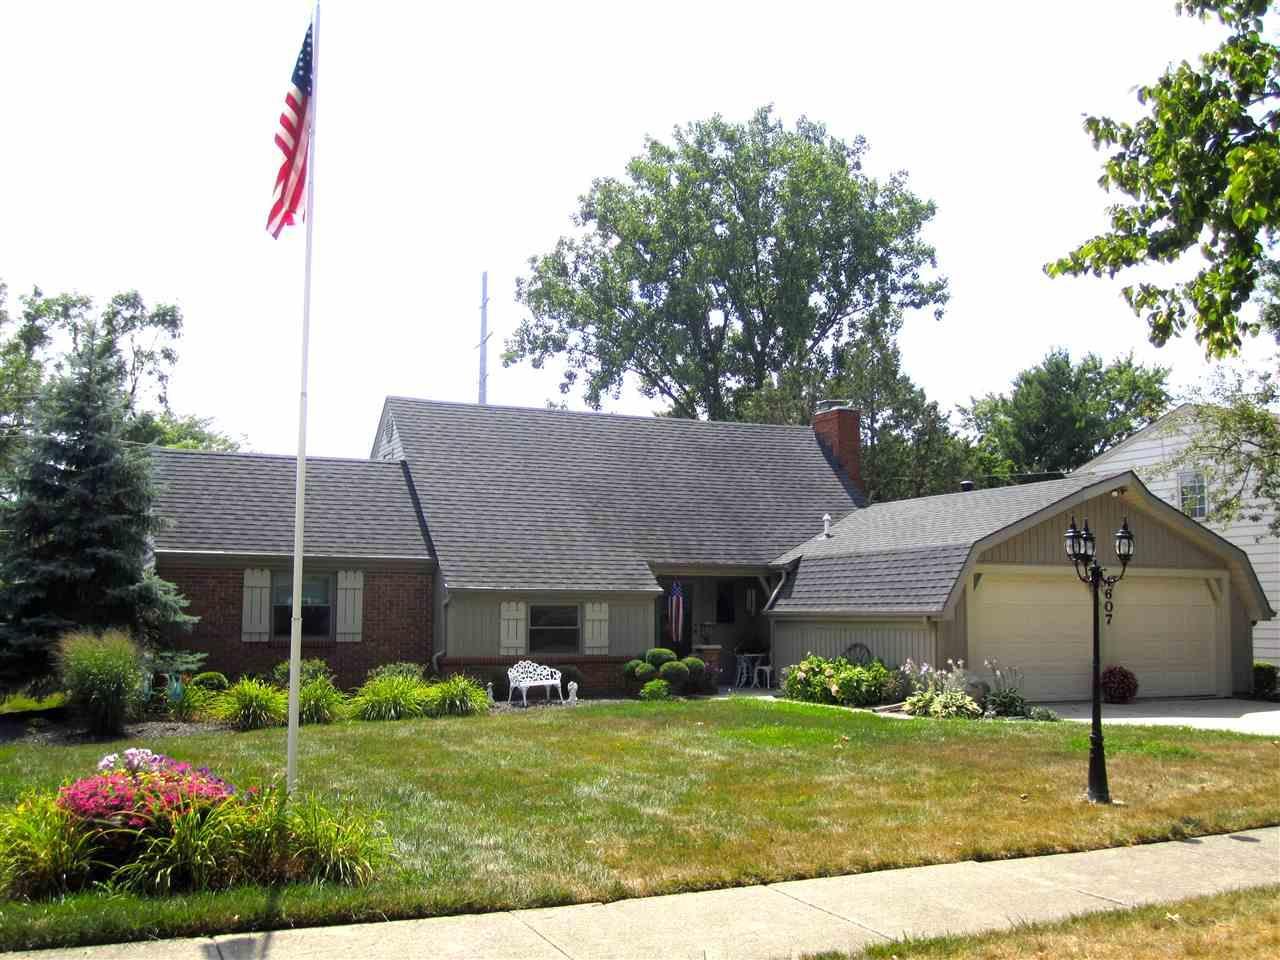 Arlington Park Real Estate - Homes for Sale in Arlington ...